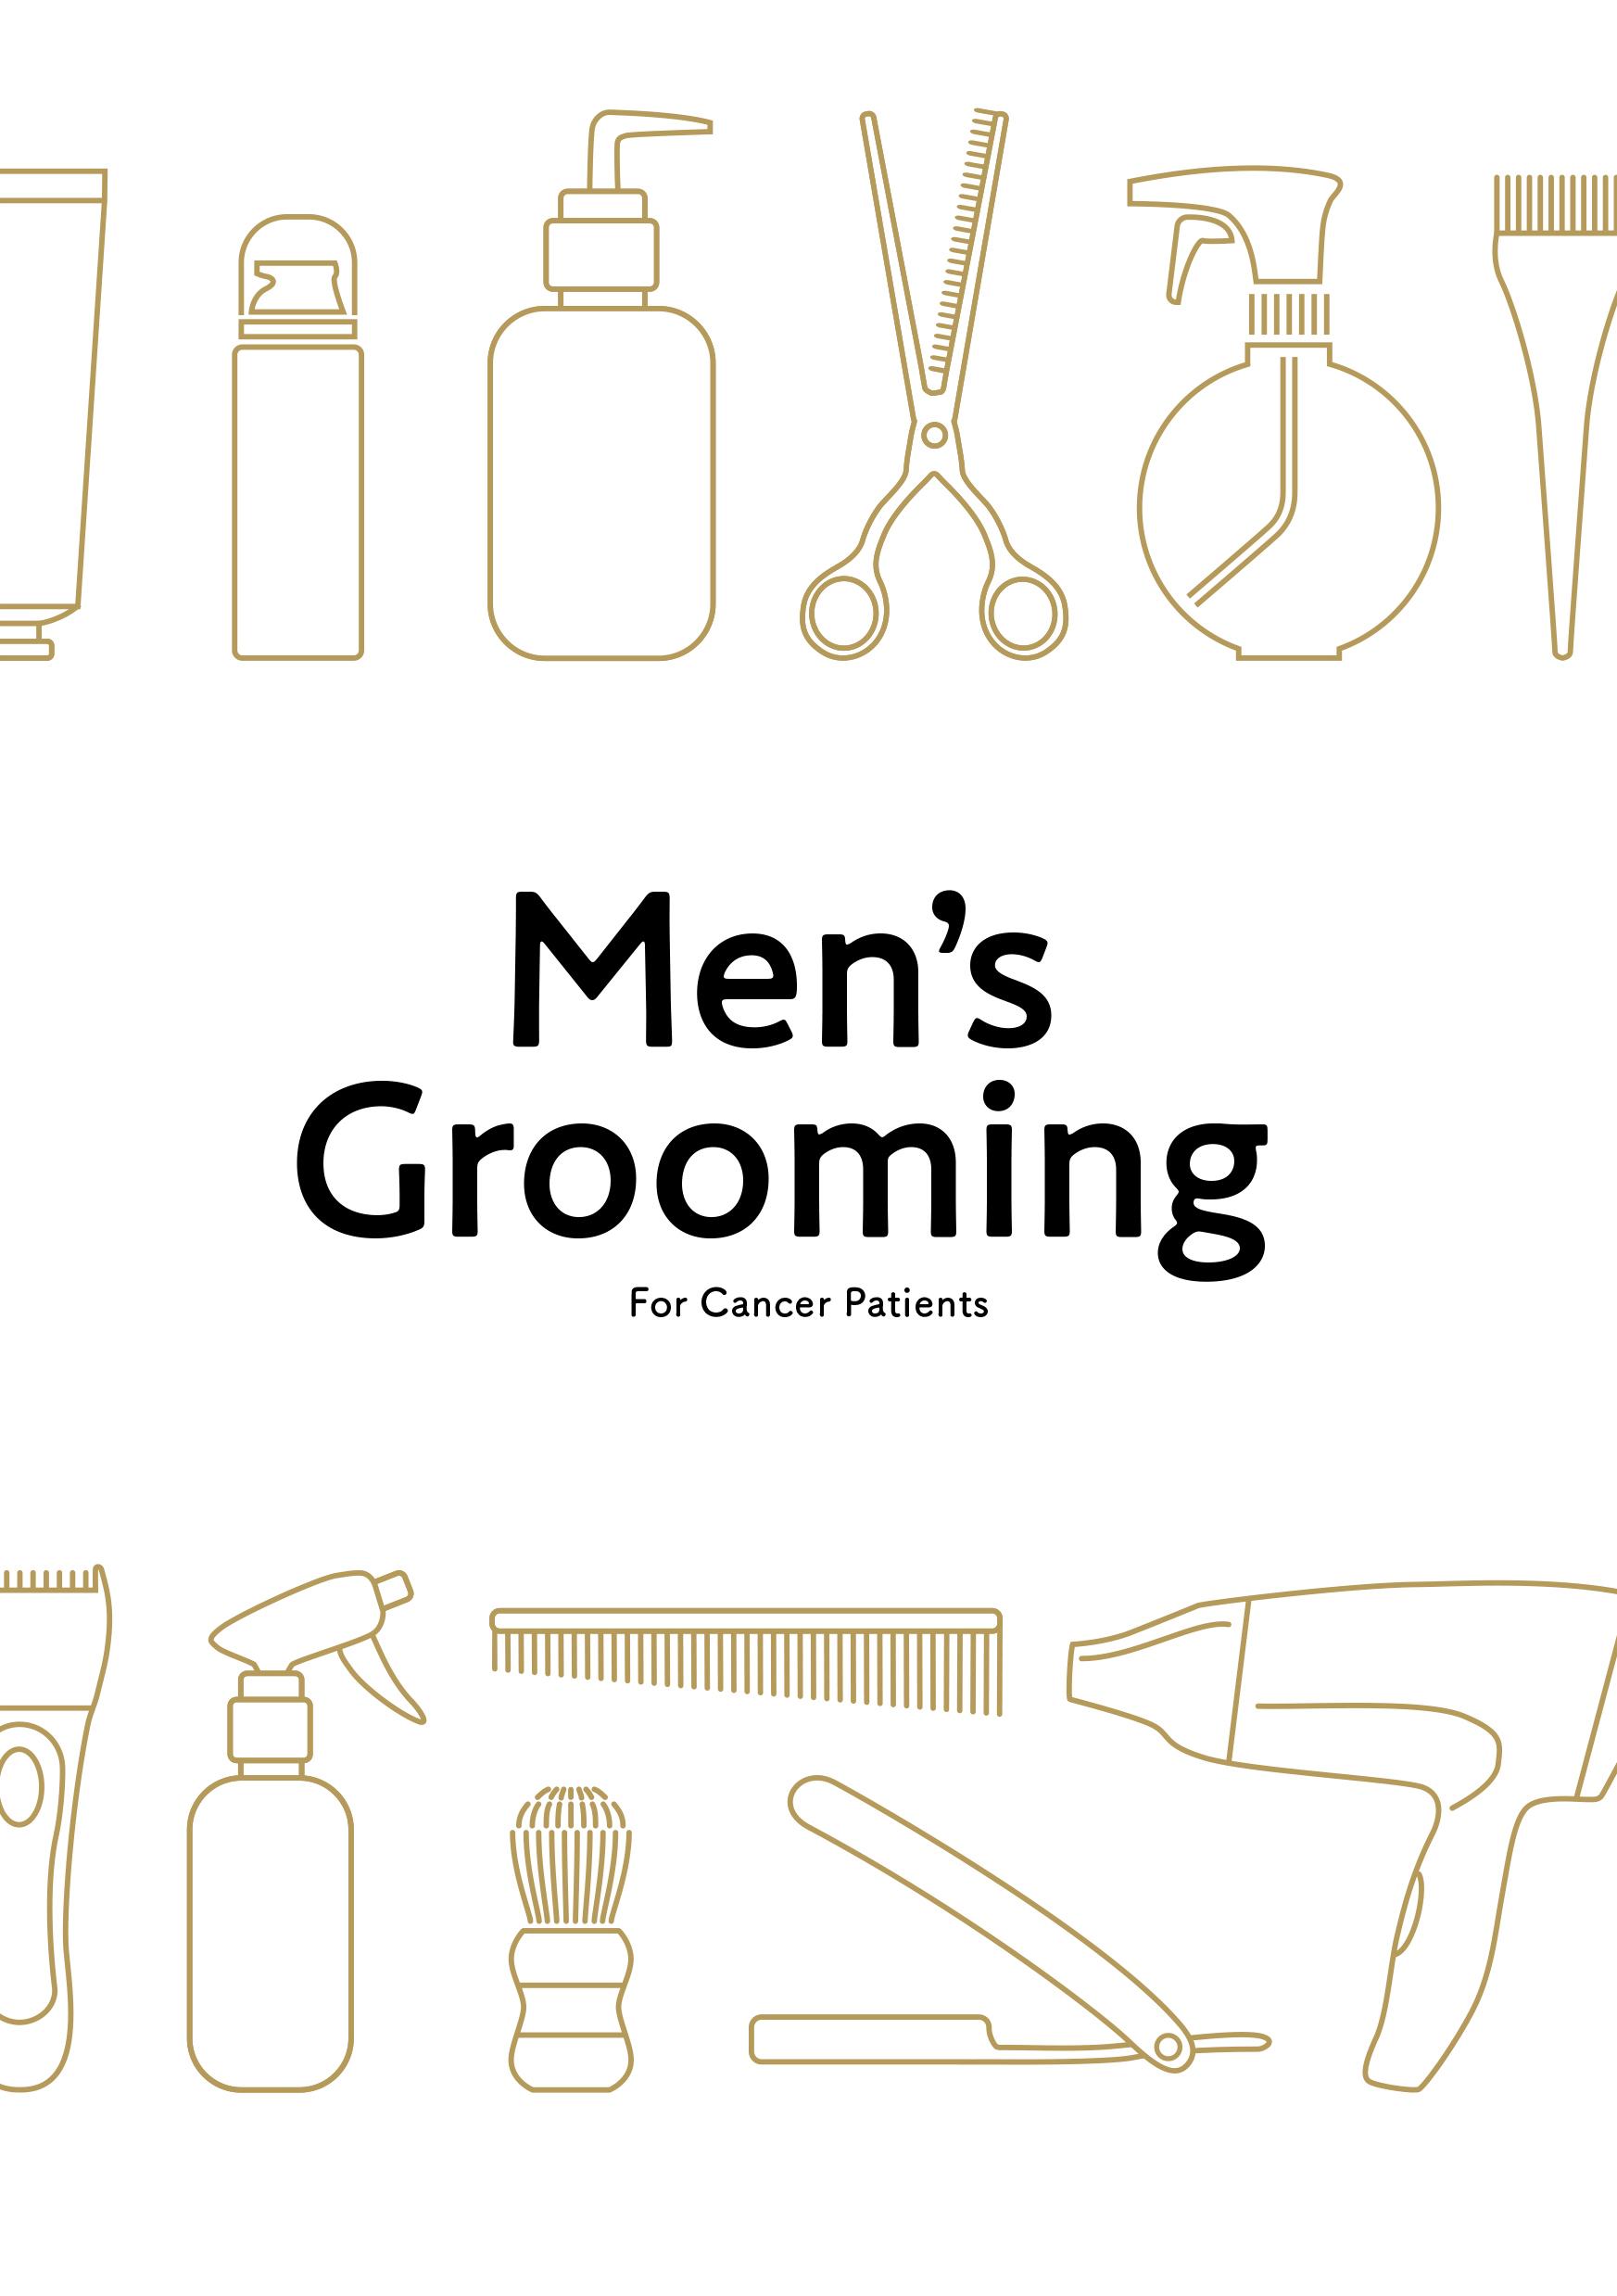 Shisheido Men's Grooming For Cancer Patients